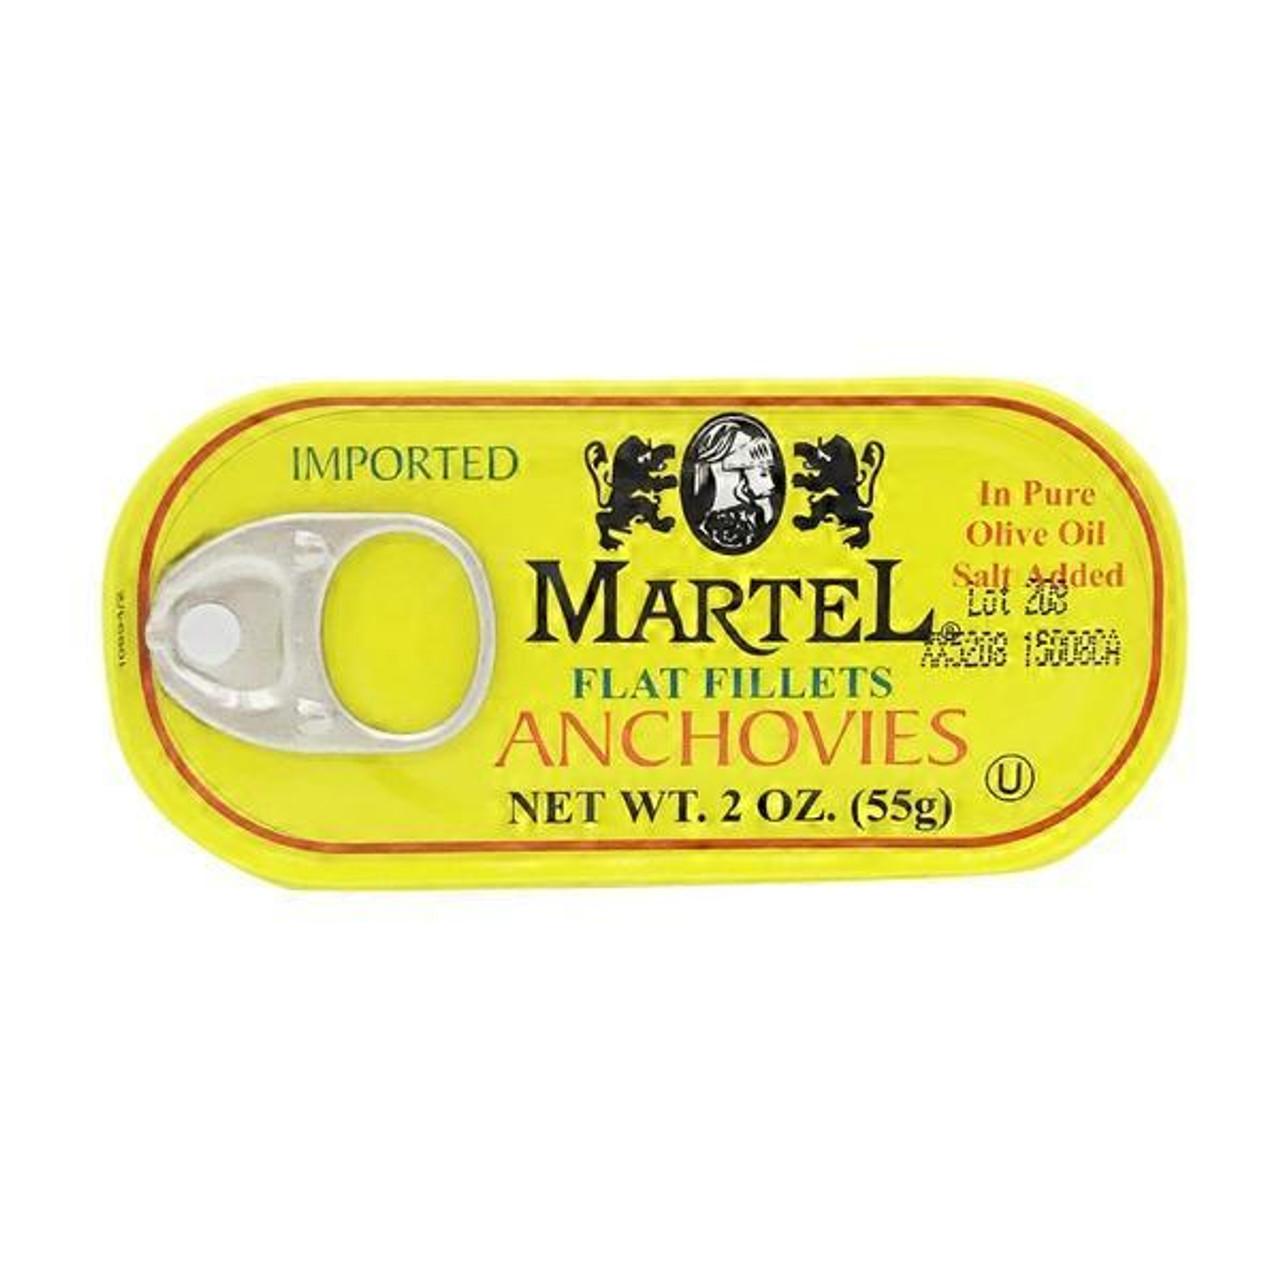 MARTEL Flat Fillets Anchovies 55g